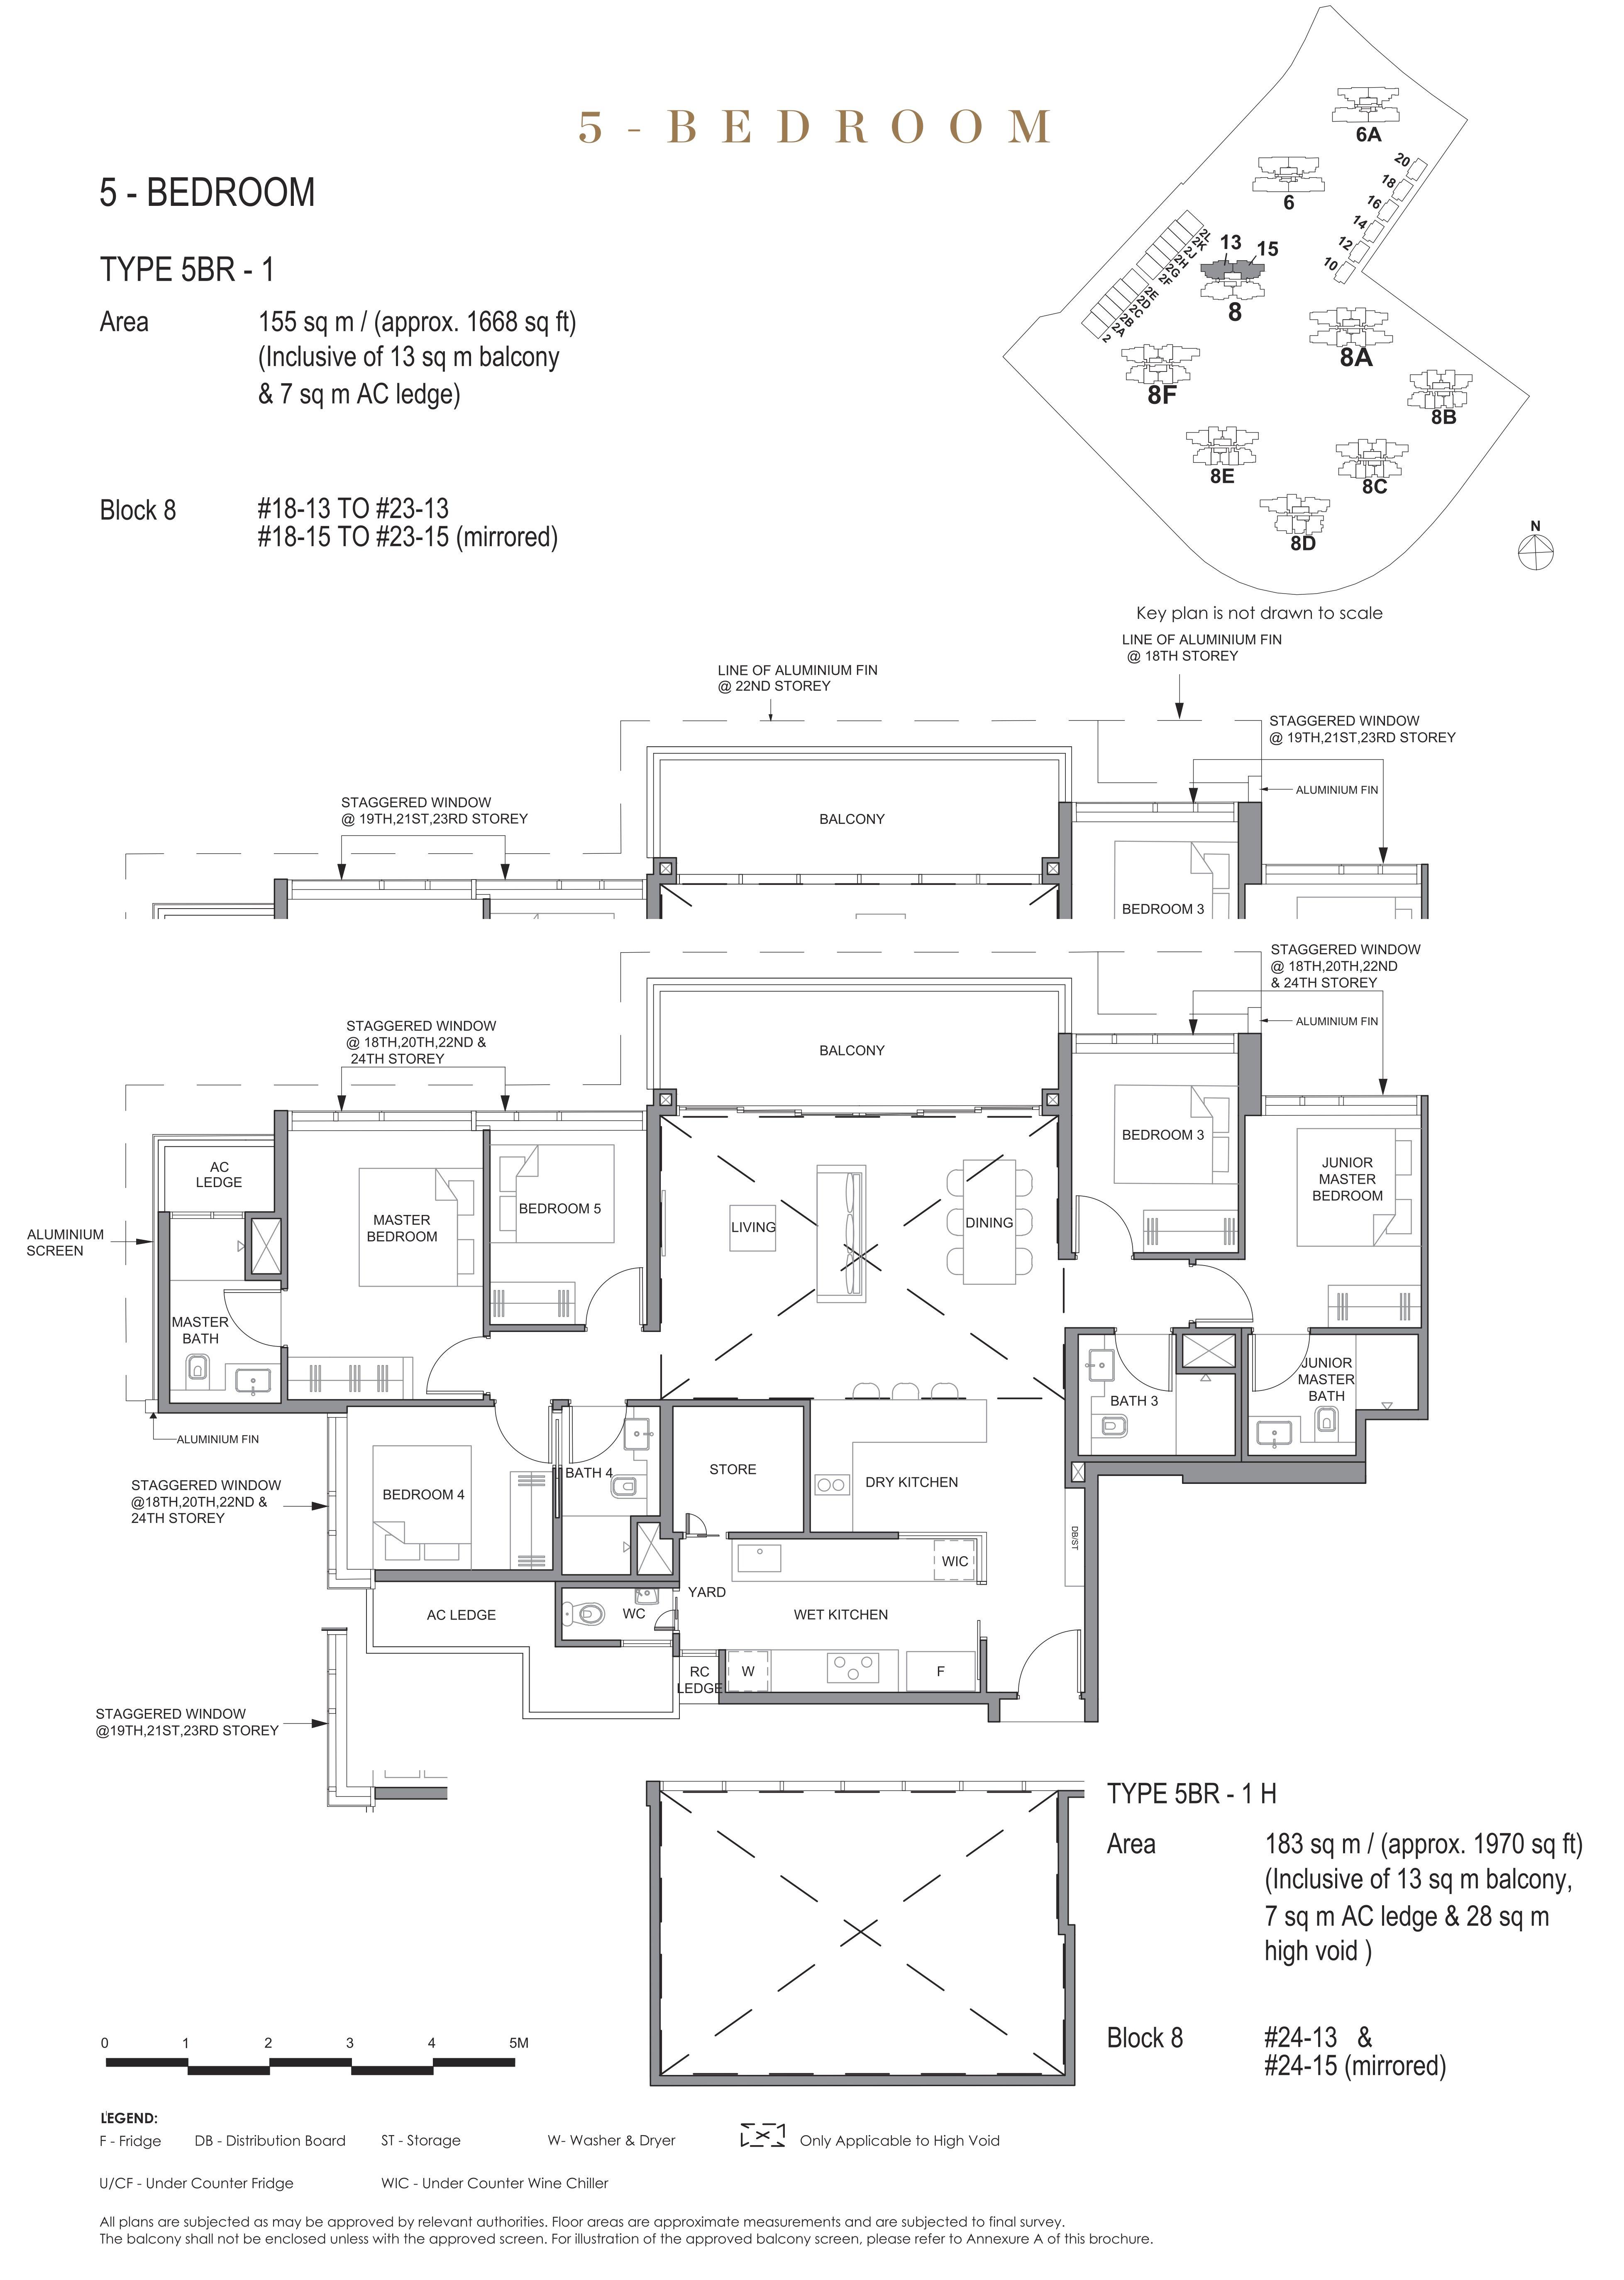 Parc Clematis 锦泰门第 elegance 5 bedroom 5卧房 5BR-1